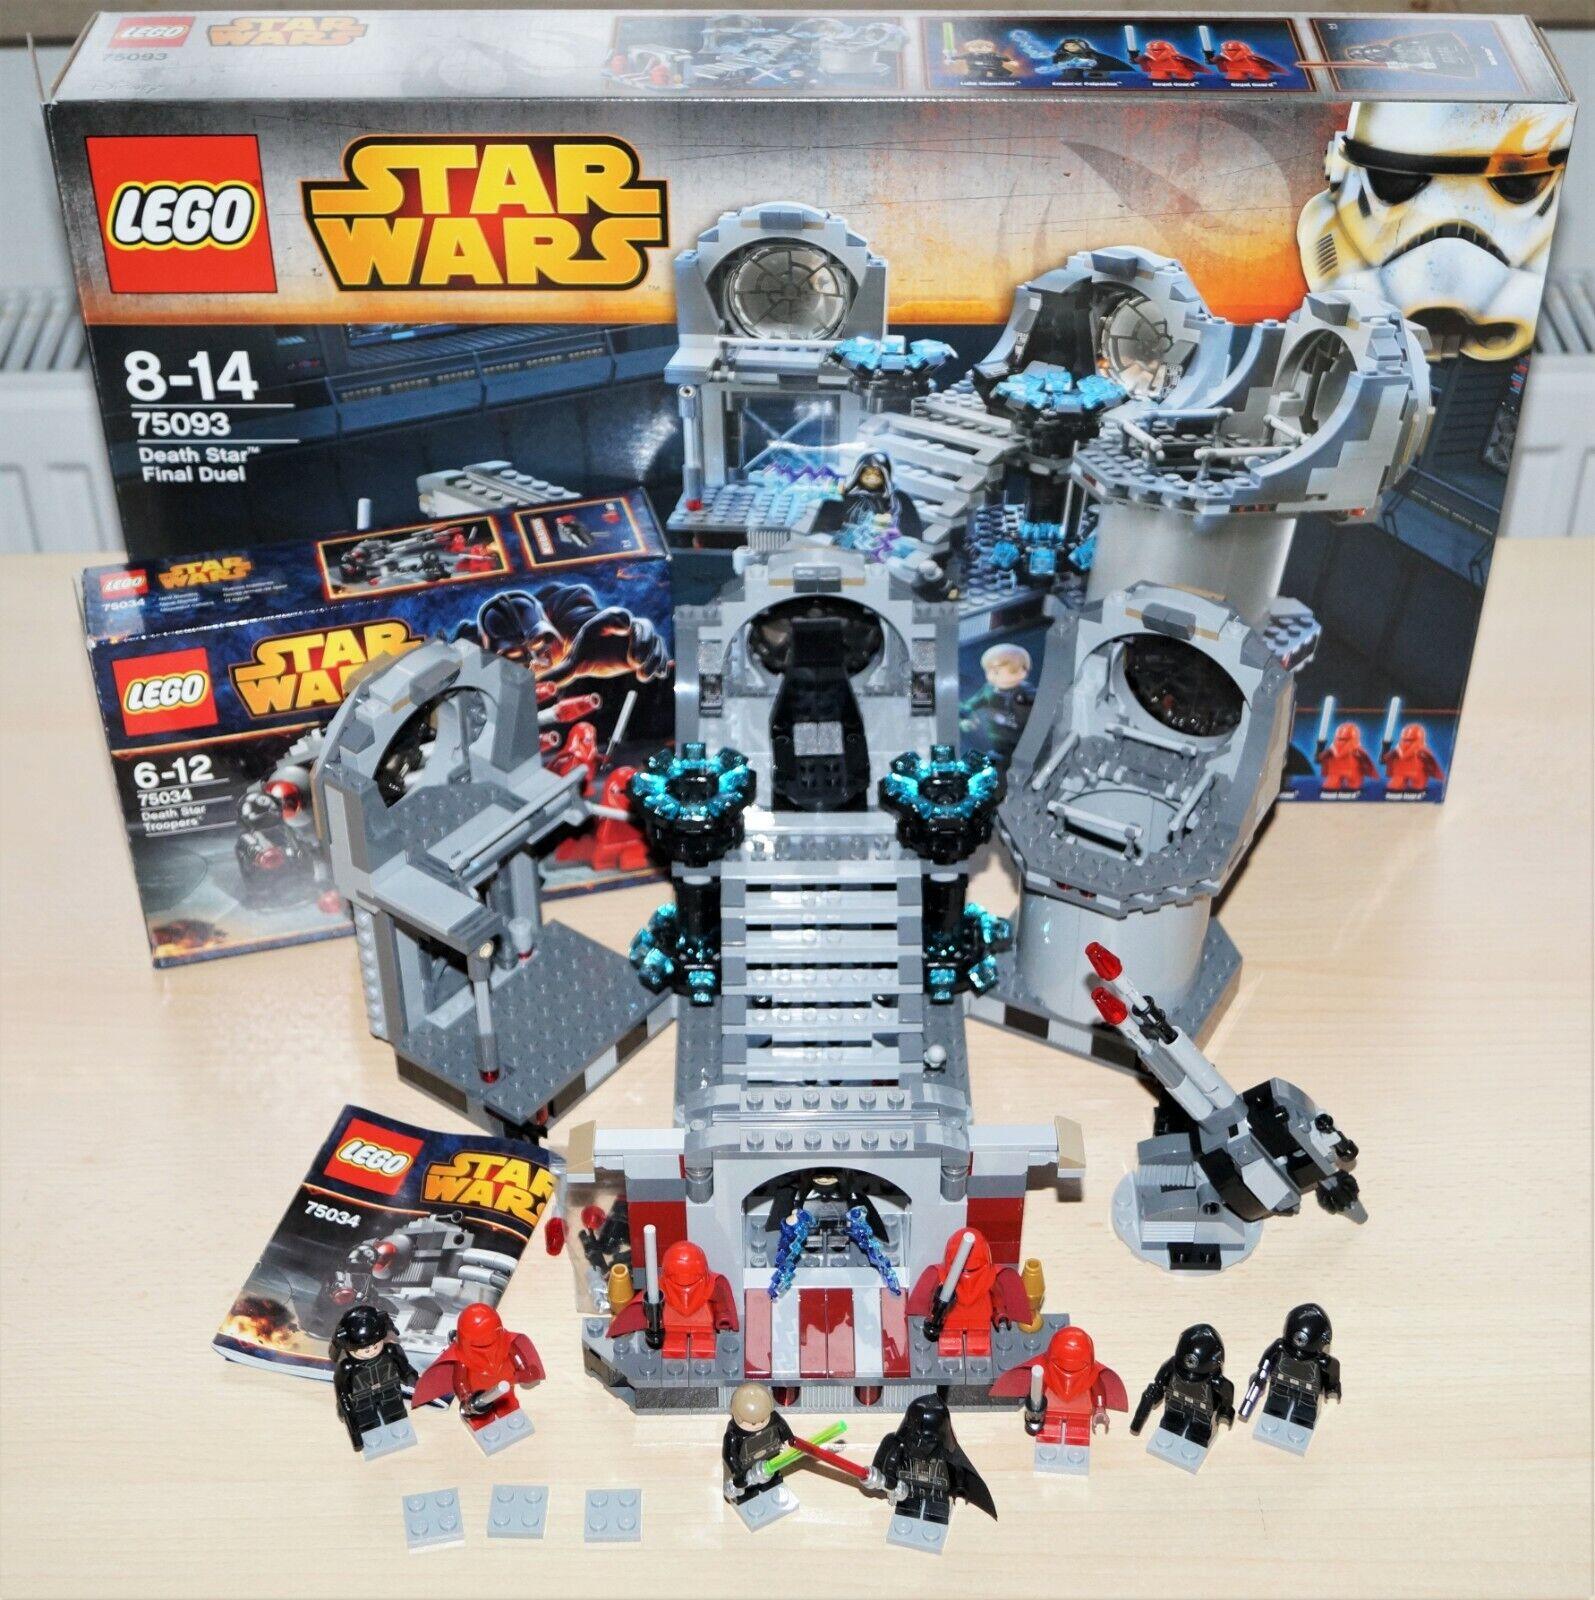 LEGO Star Wars 75093 + 75034 Final Duell + Death Star Trooper OVP   OBA